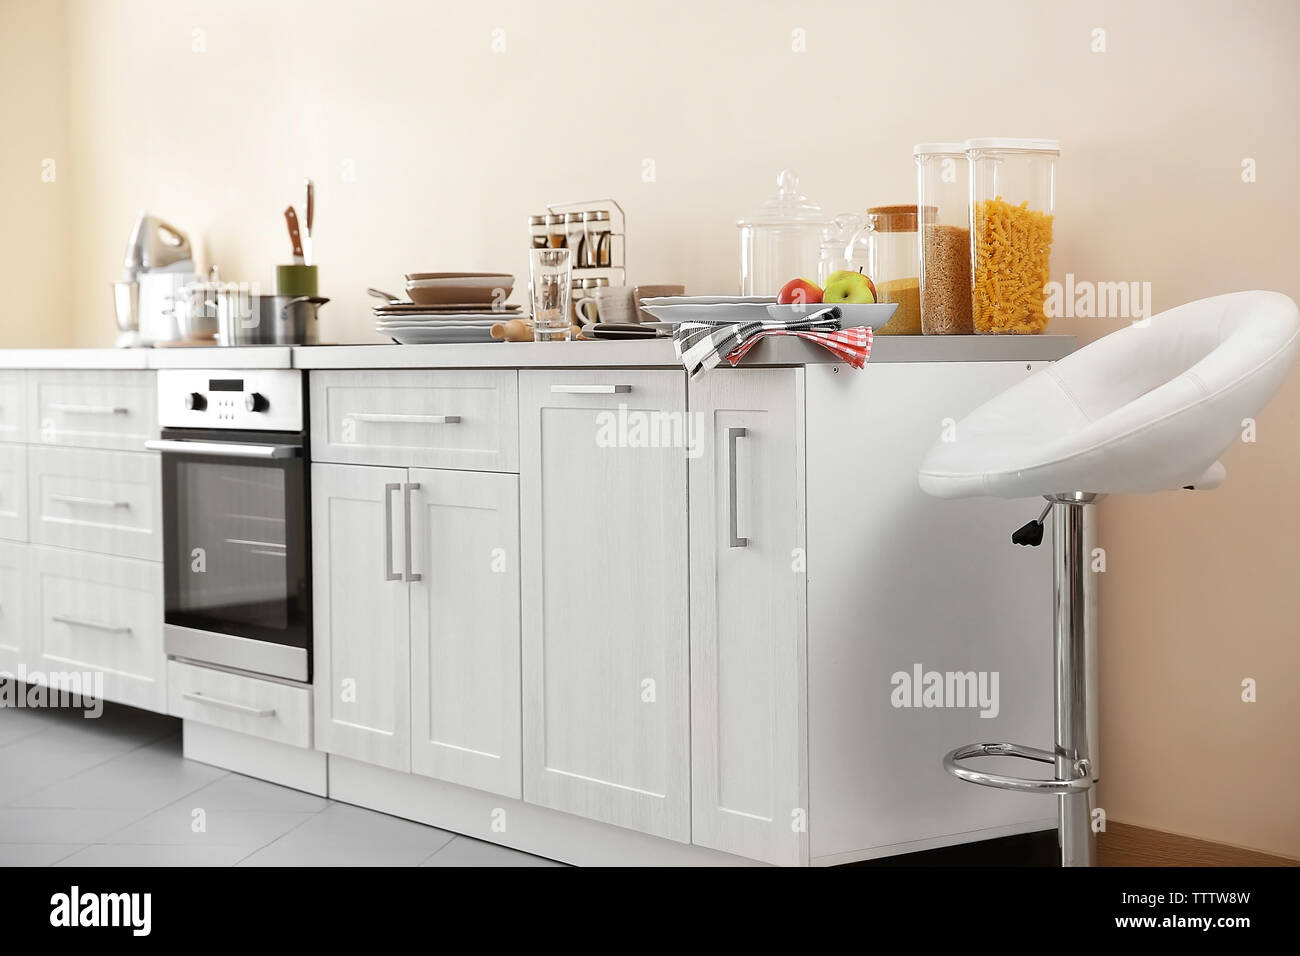 Modern kitchen interior - Stock Image